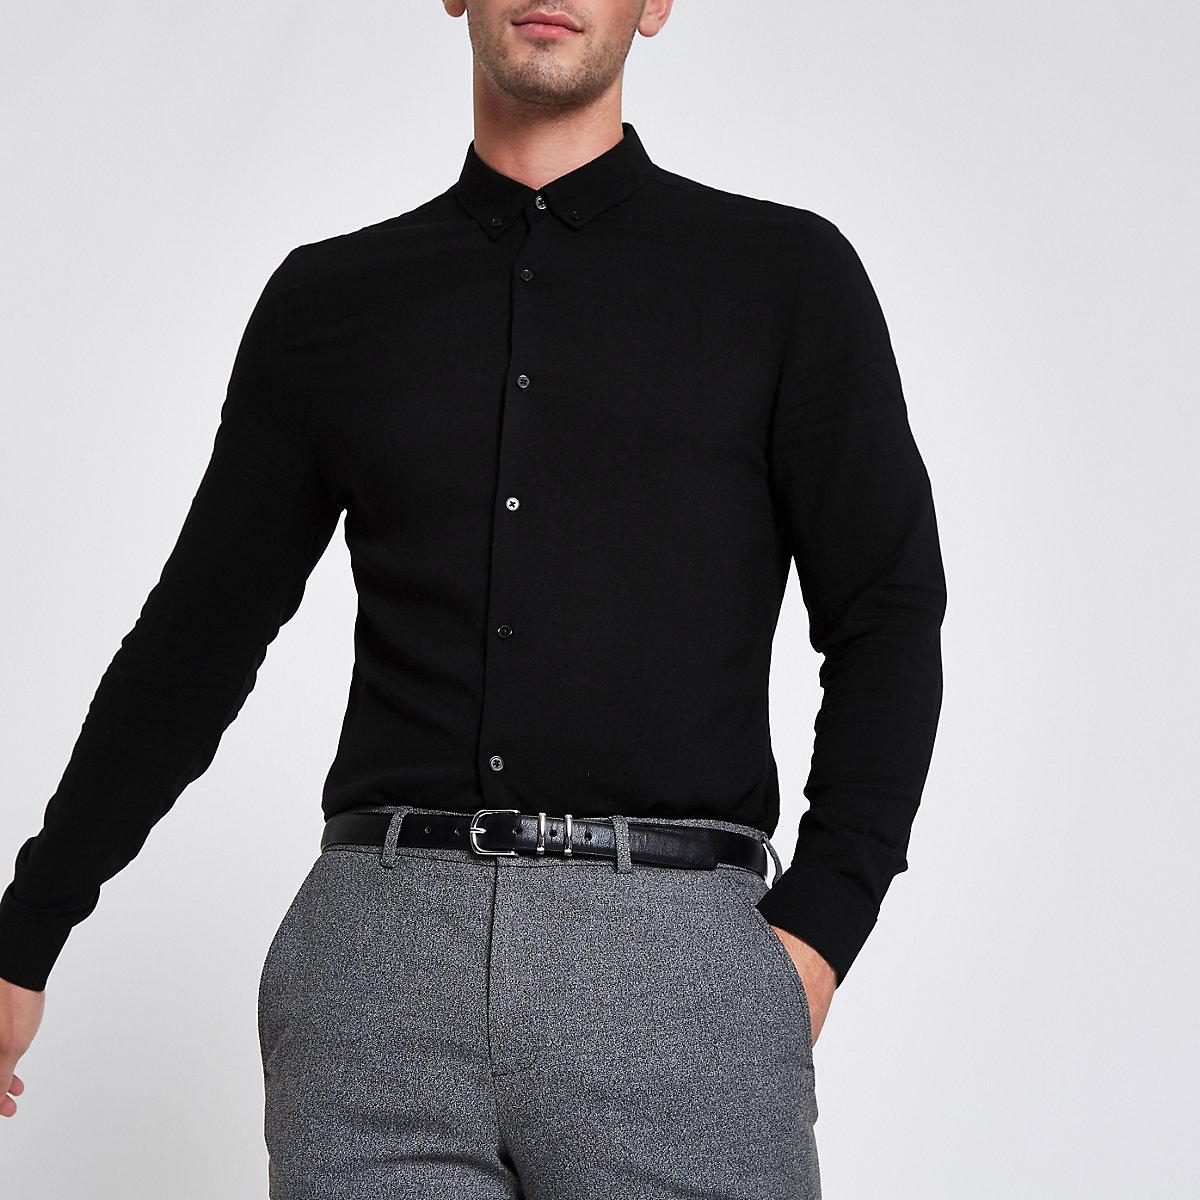 Black button-down long sleeve shirt